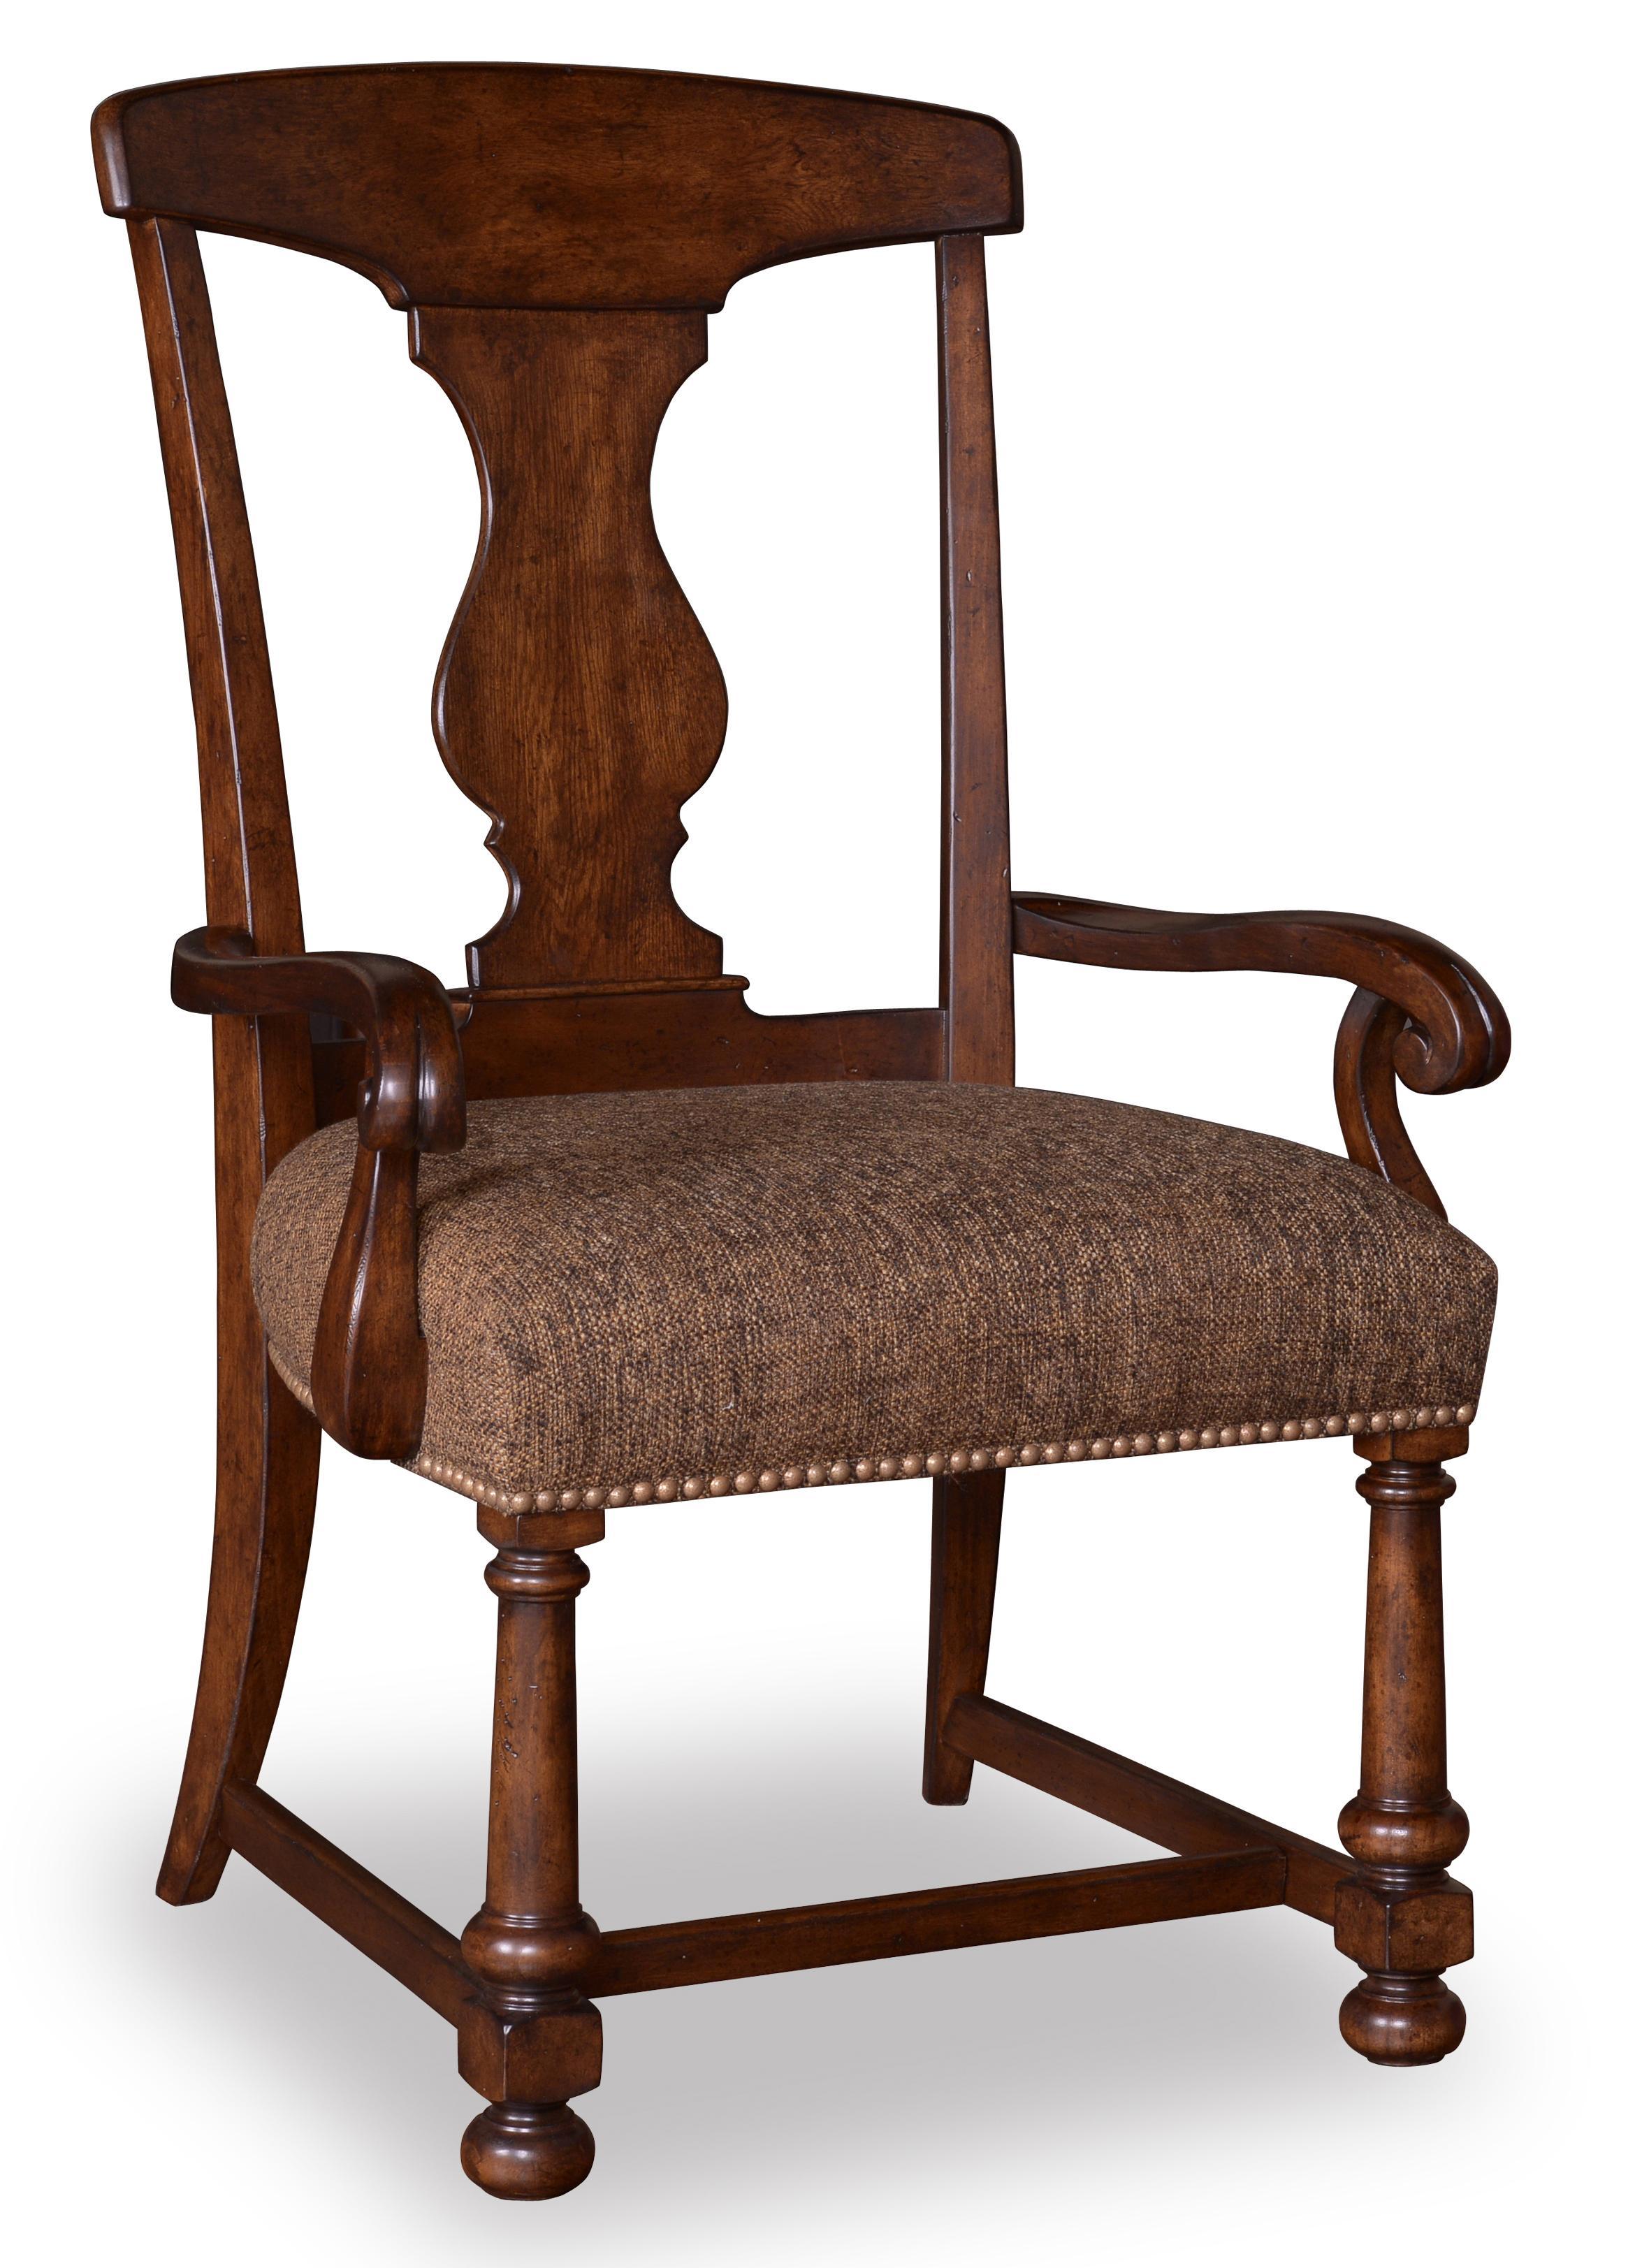 Belfort Signature Belvedere Splat-Back Arm Chair - Item Number: 205205-2304